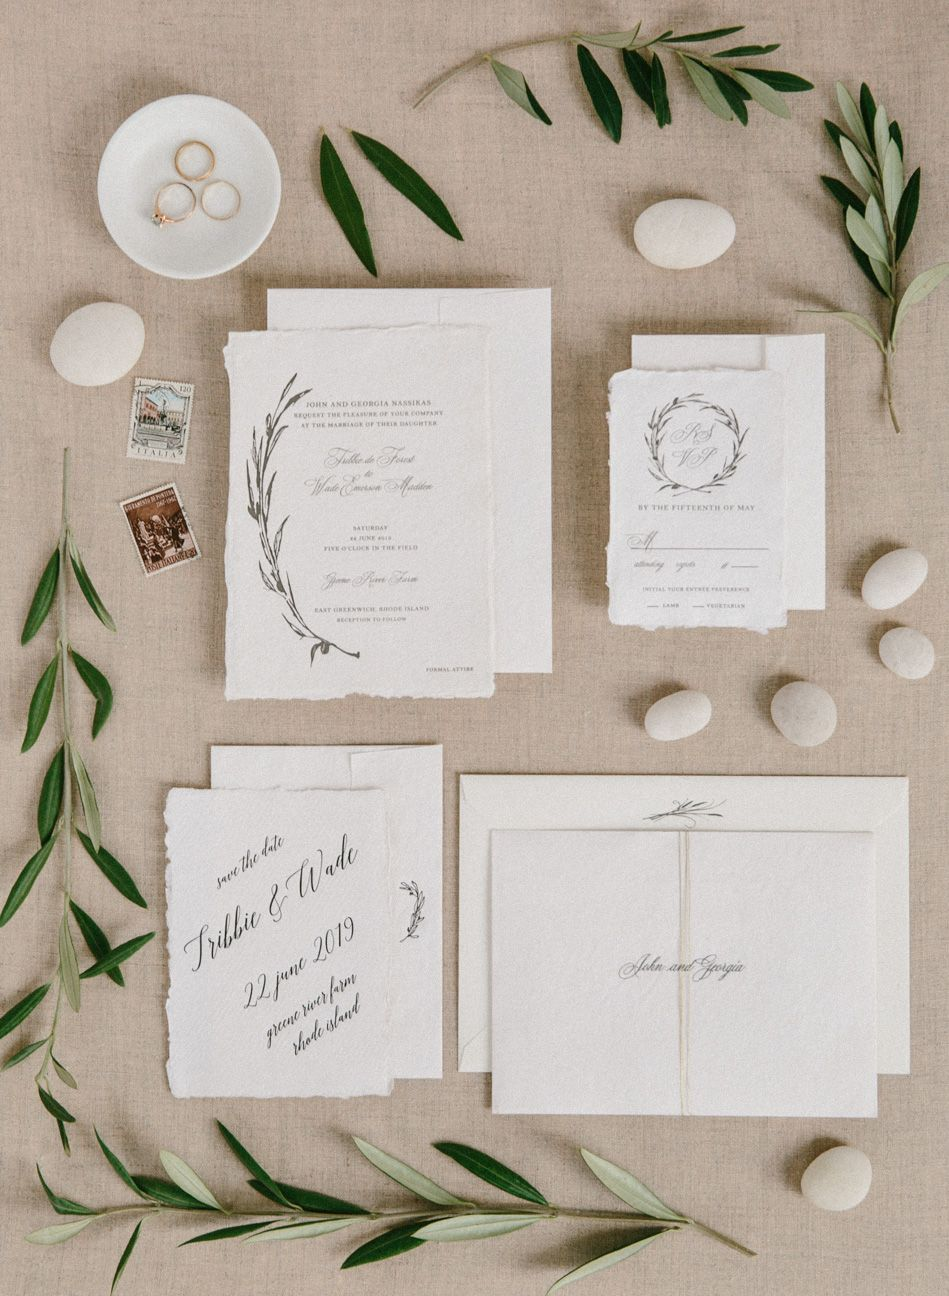 KarenHillPhotography-Nassikas-Wedding-0007-2.jpg